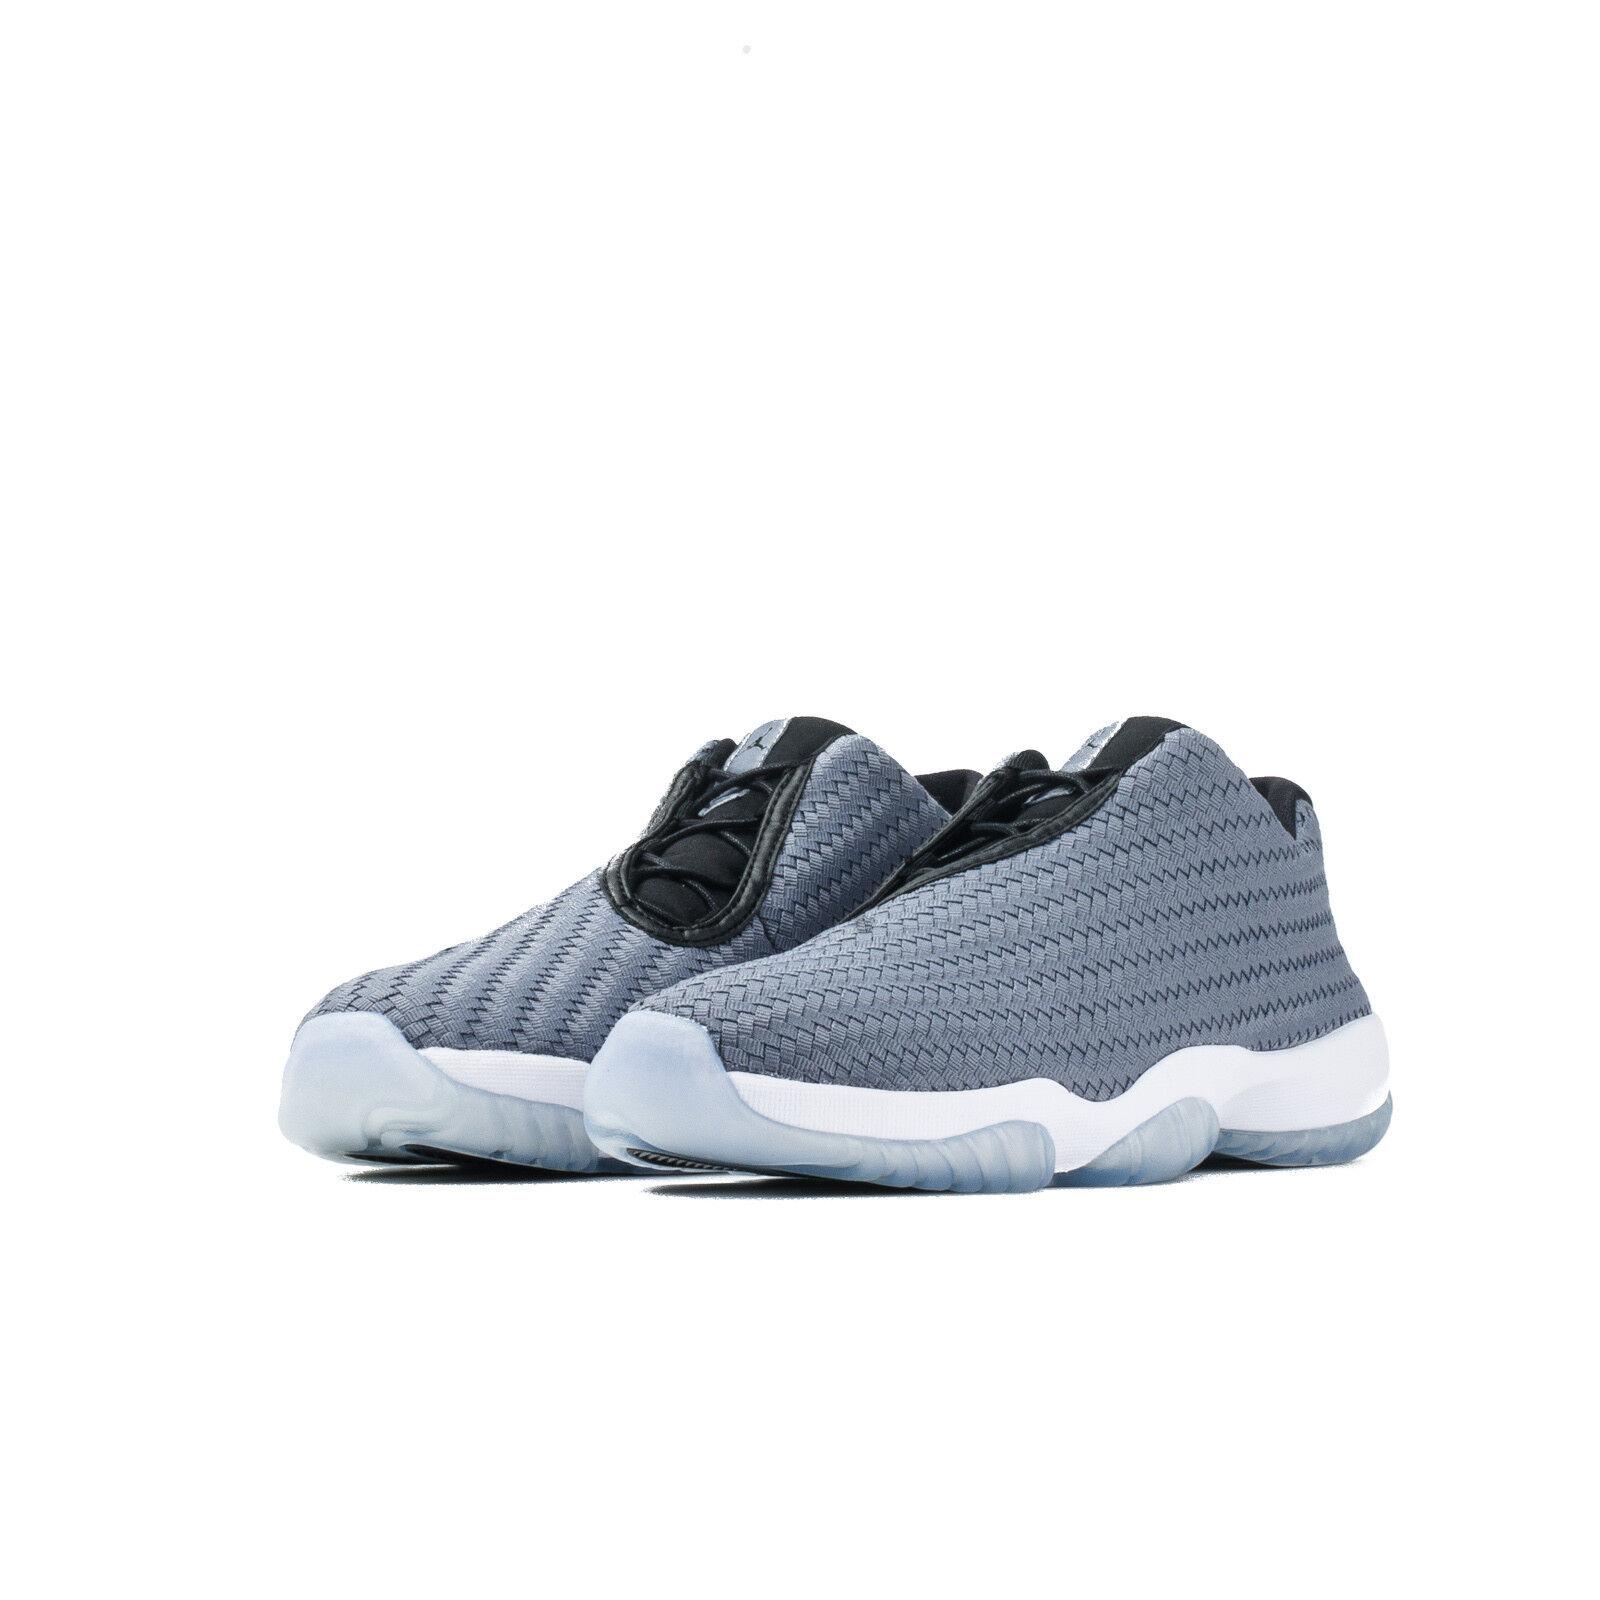 Air Jordan Futur Site Officiel Ebay Noir Blanc